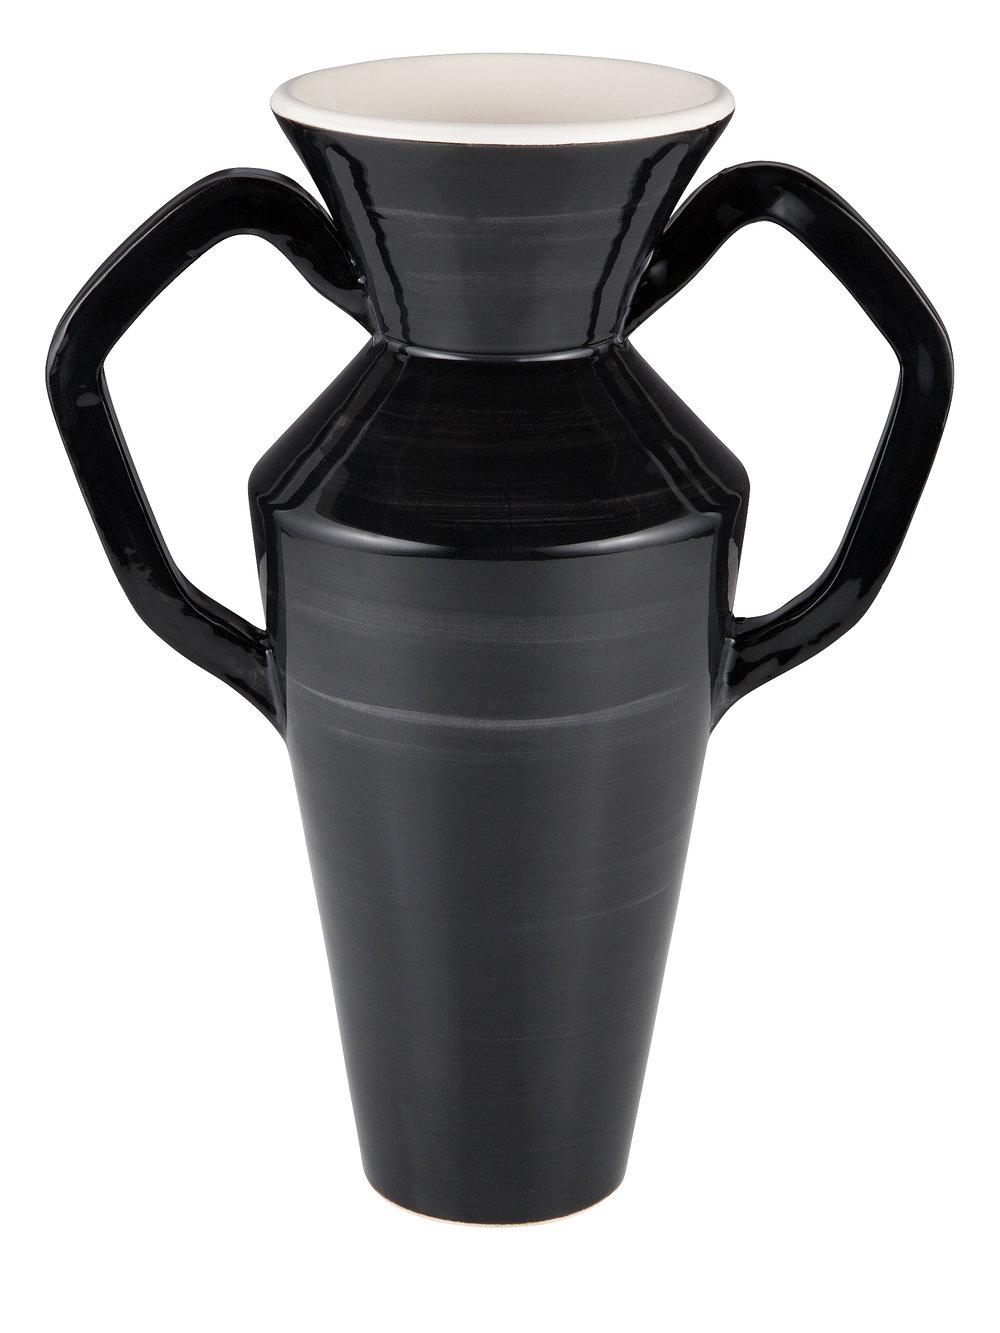 Amphora_M_Calimero.jpg